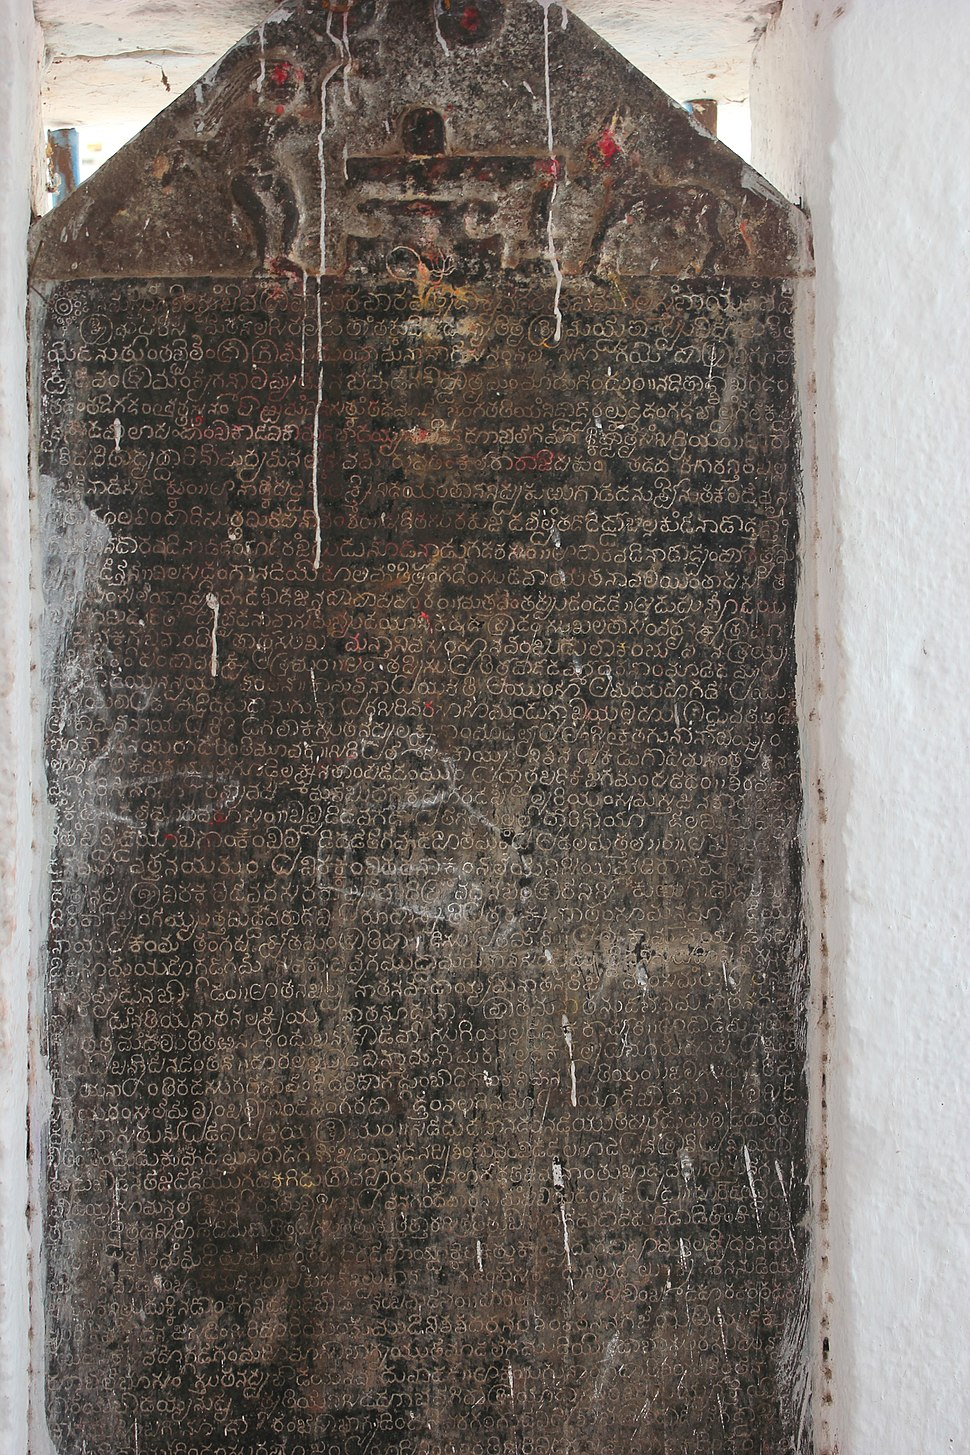 Old Kannada inscription from the Rashtrakuta period (9th century) at the Durga Devi temple in Virupaksha temple complex at Hampi